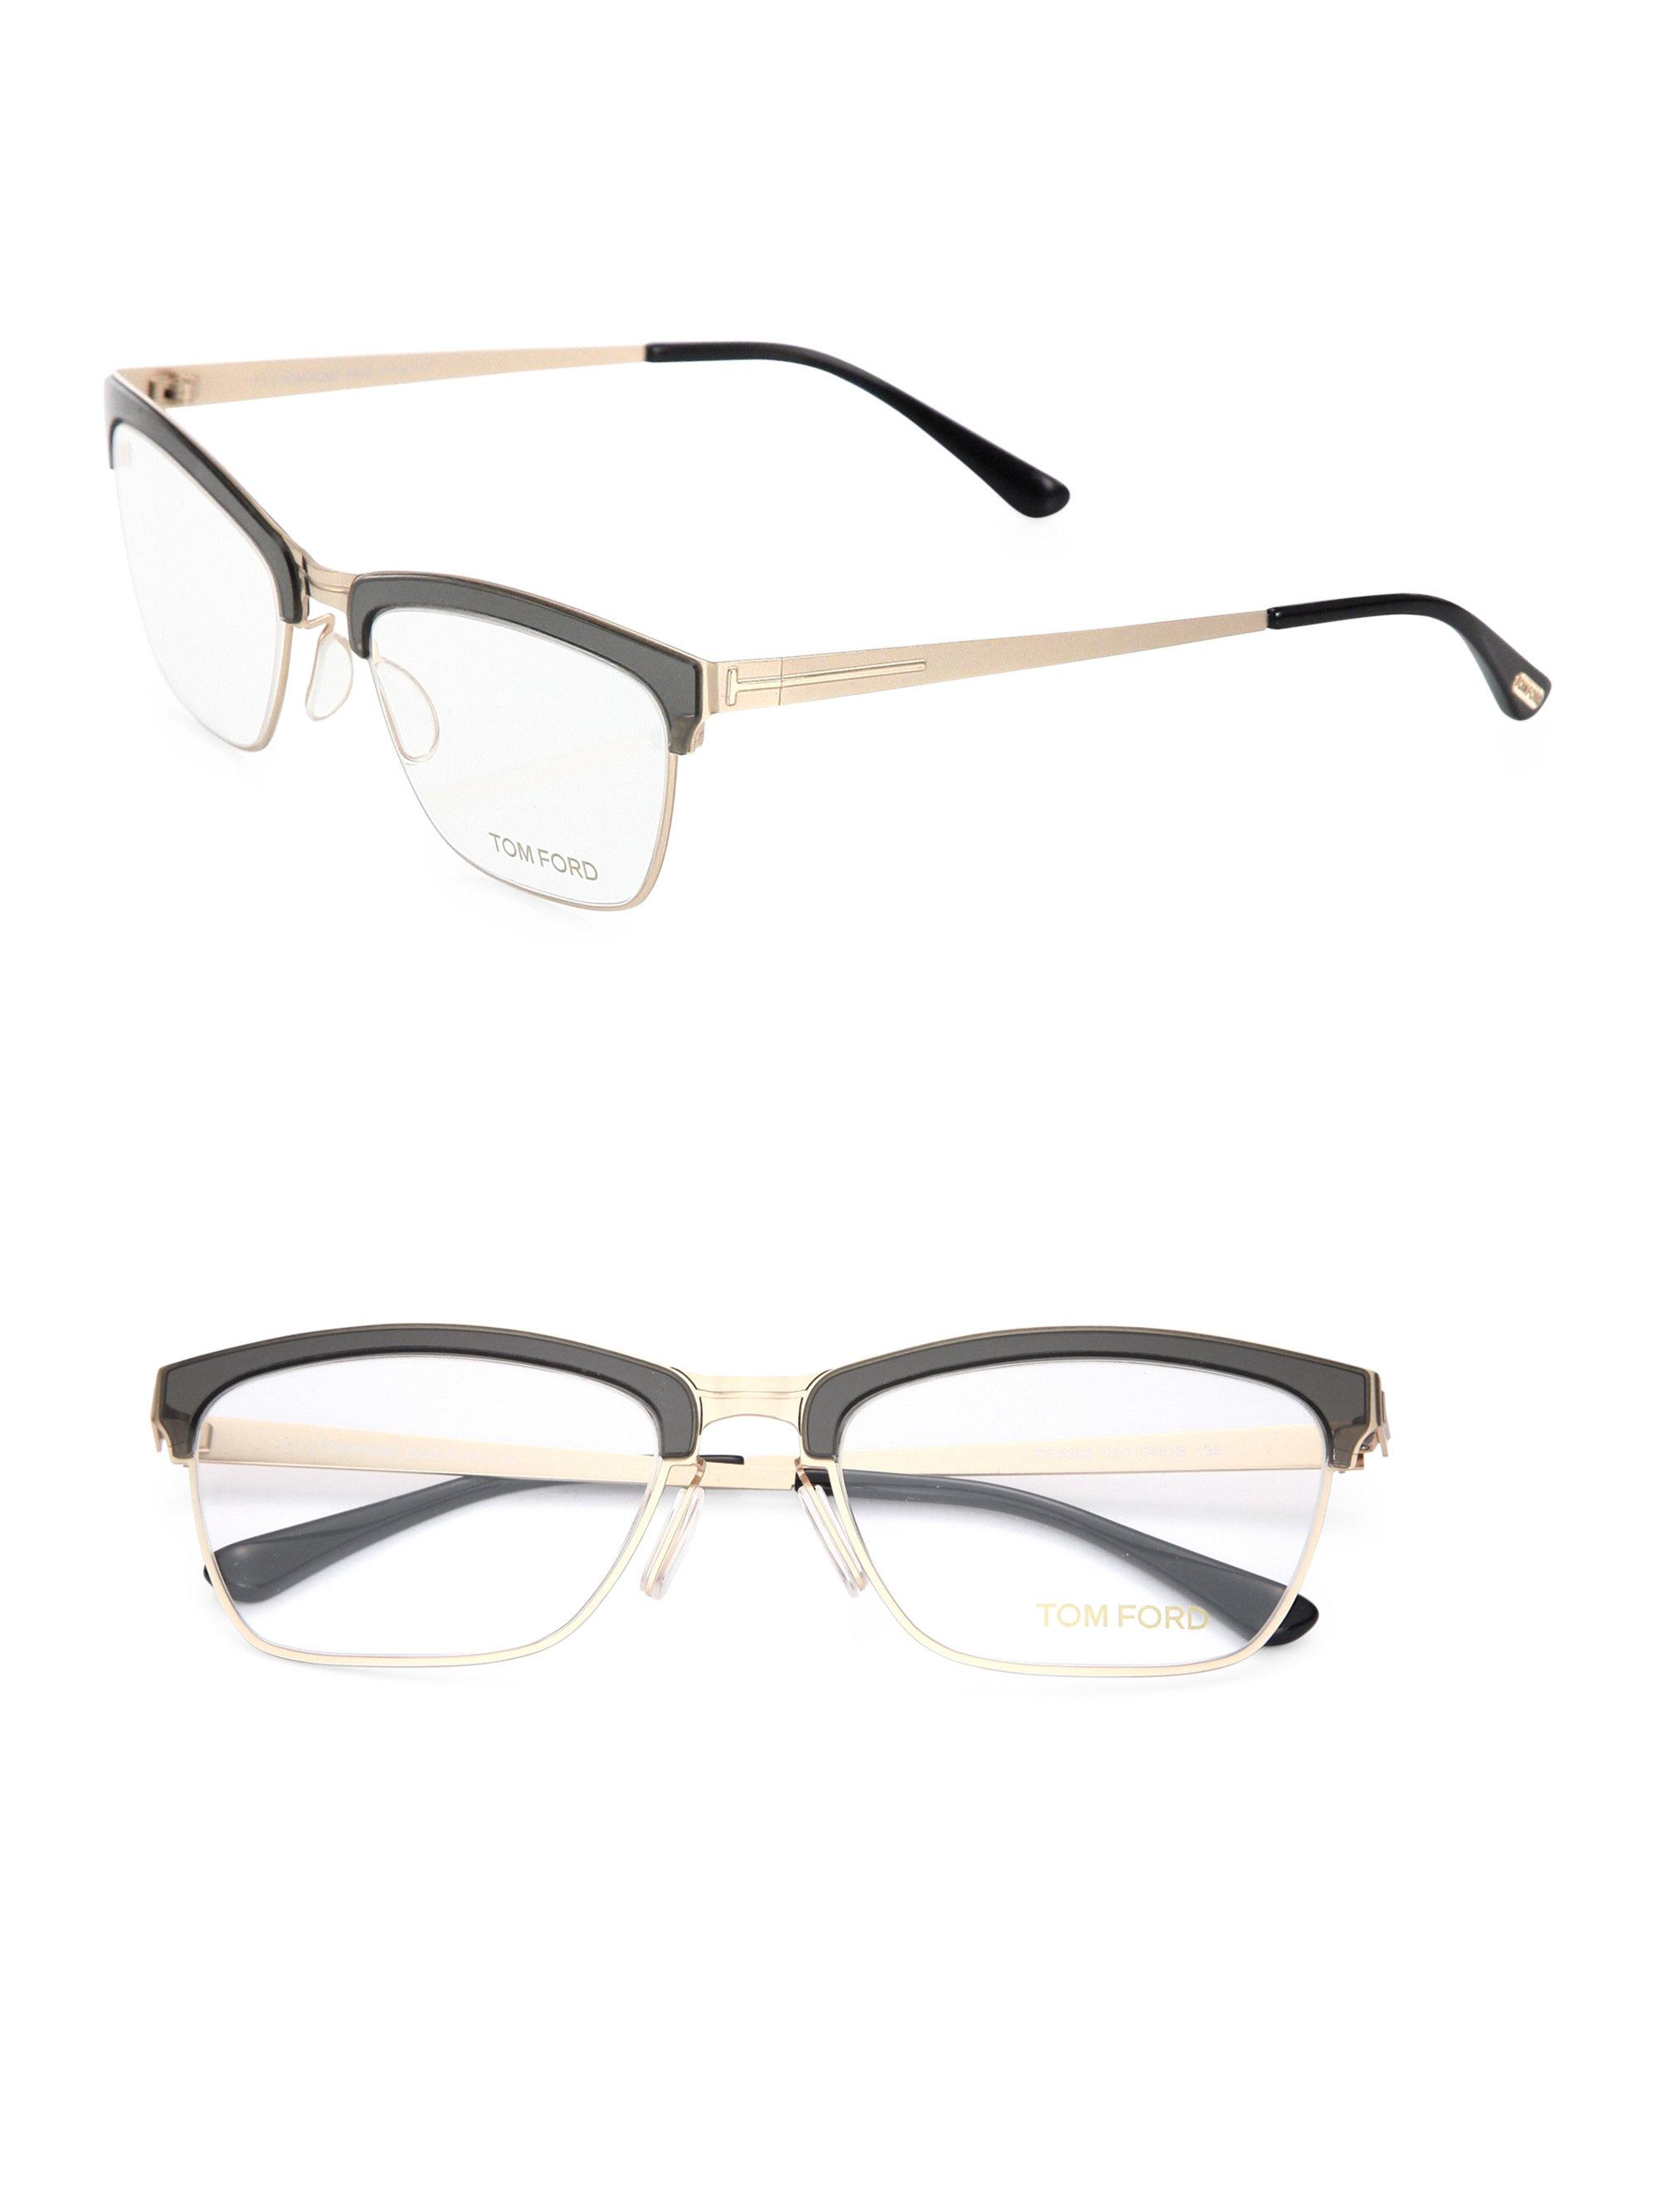 4e4a1b21e6 Tom Ford 54mm Metal Soft Square Optical Glasses in Metallic - Lyst